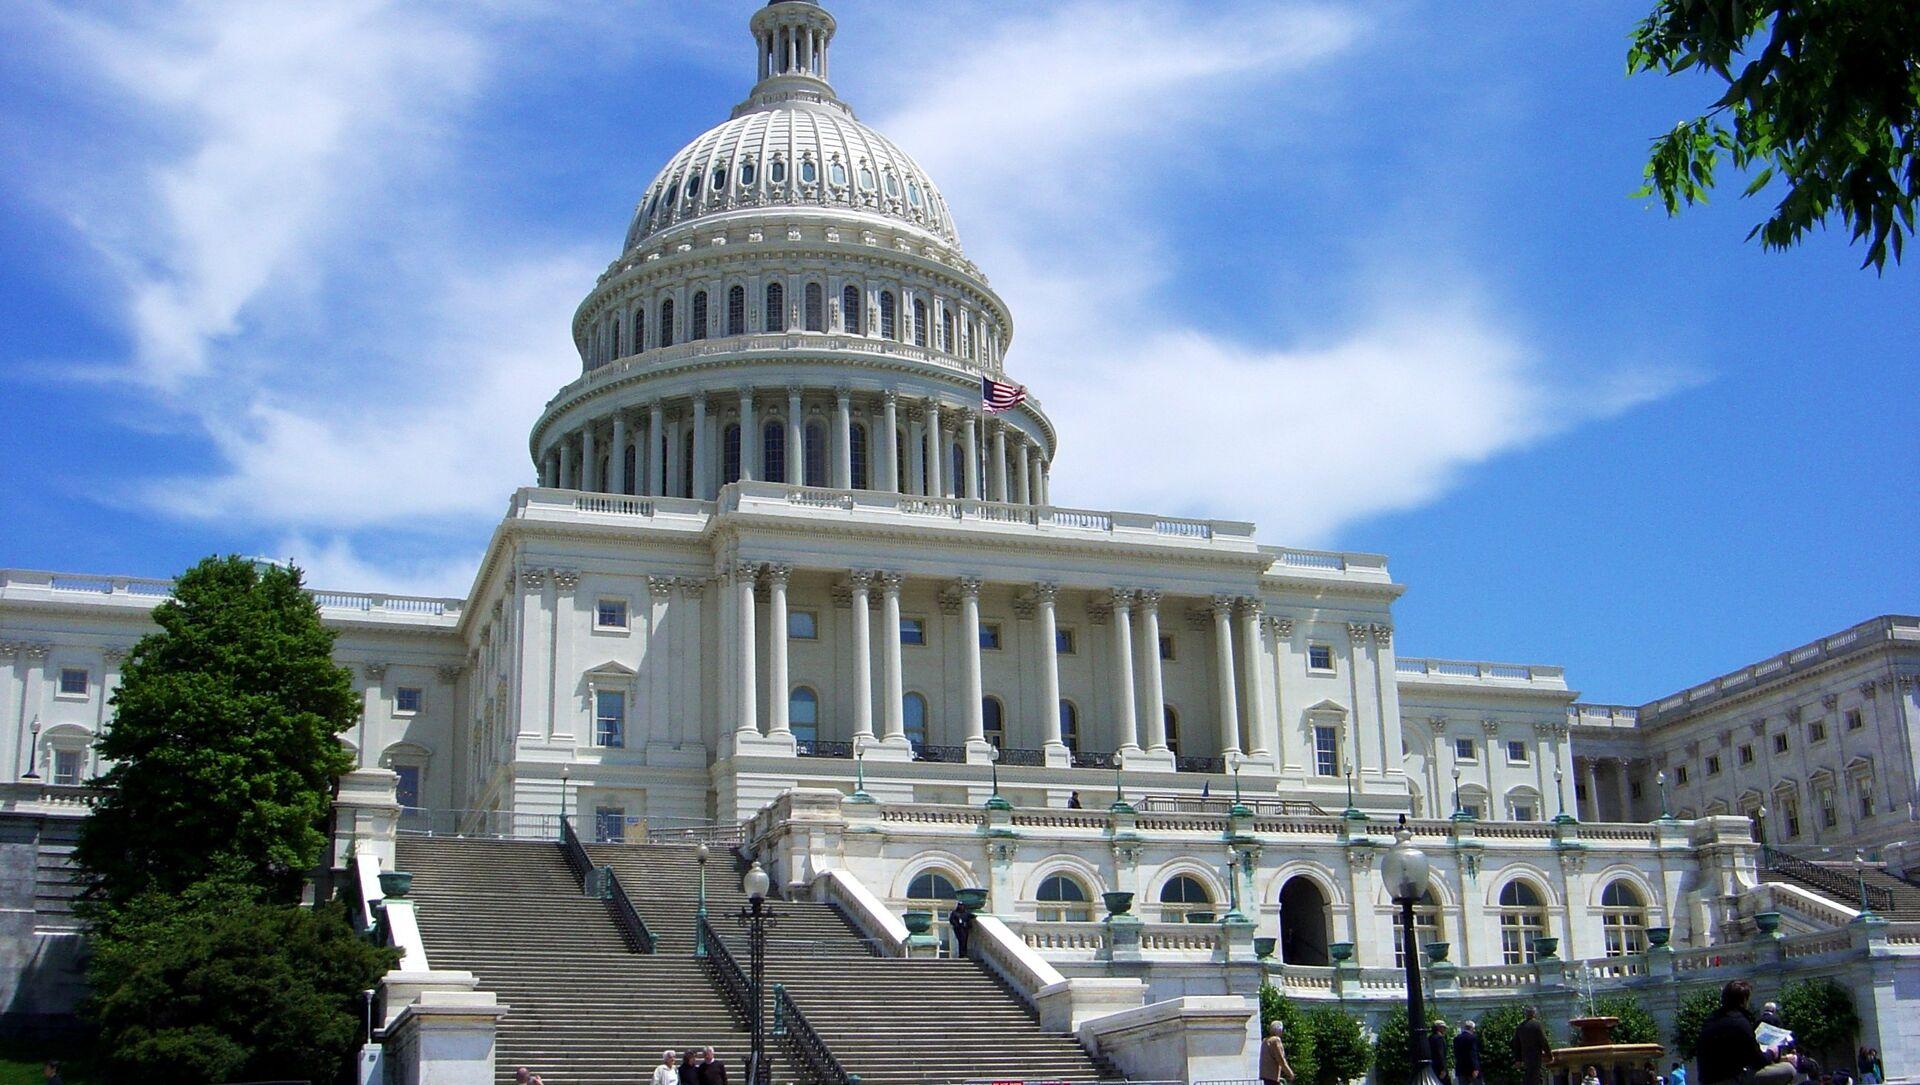 US Senate building - Sputnik International, 1920, 01.08.2021